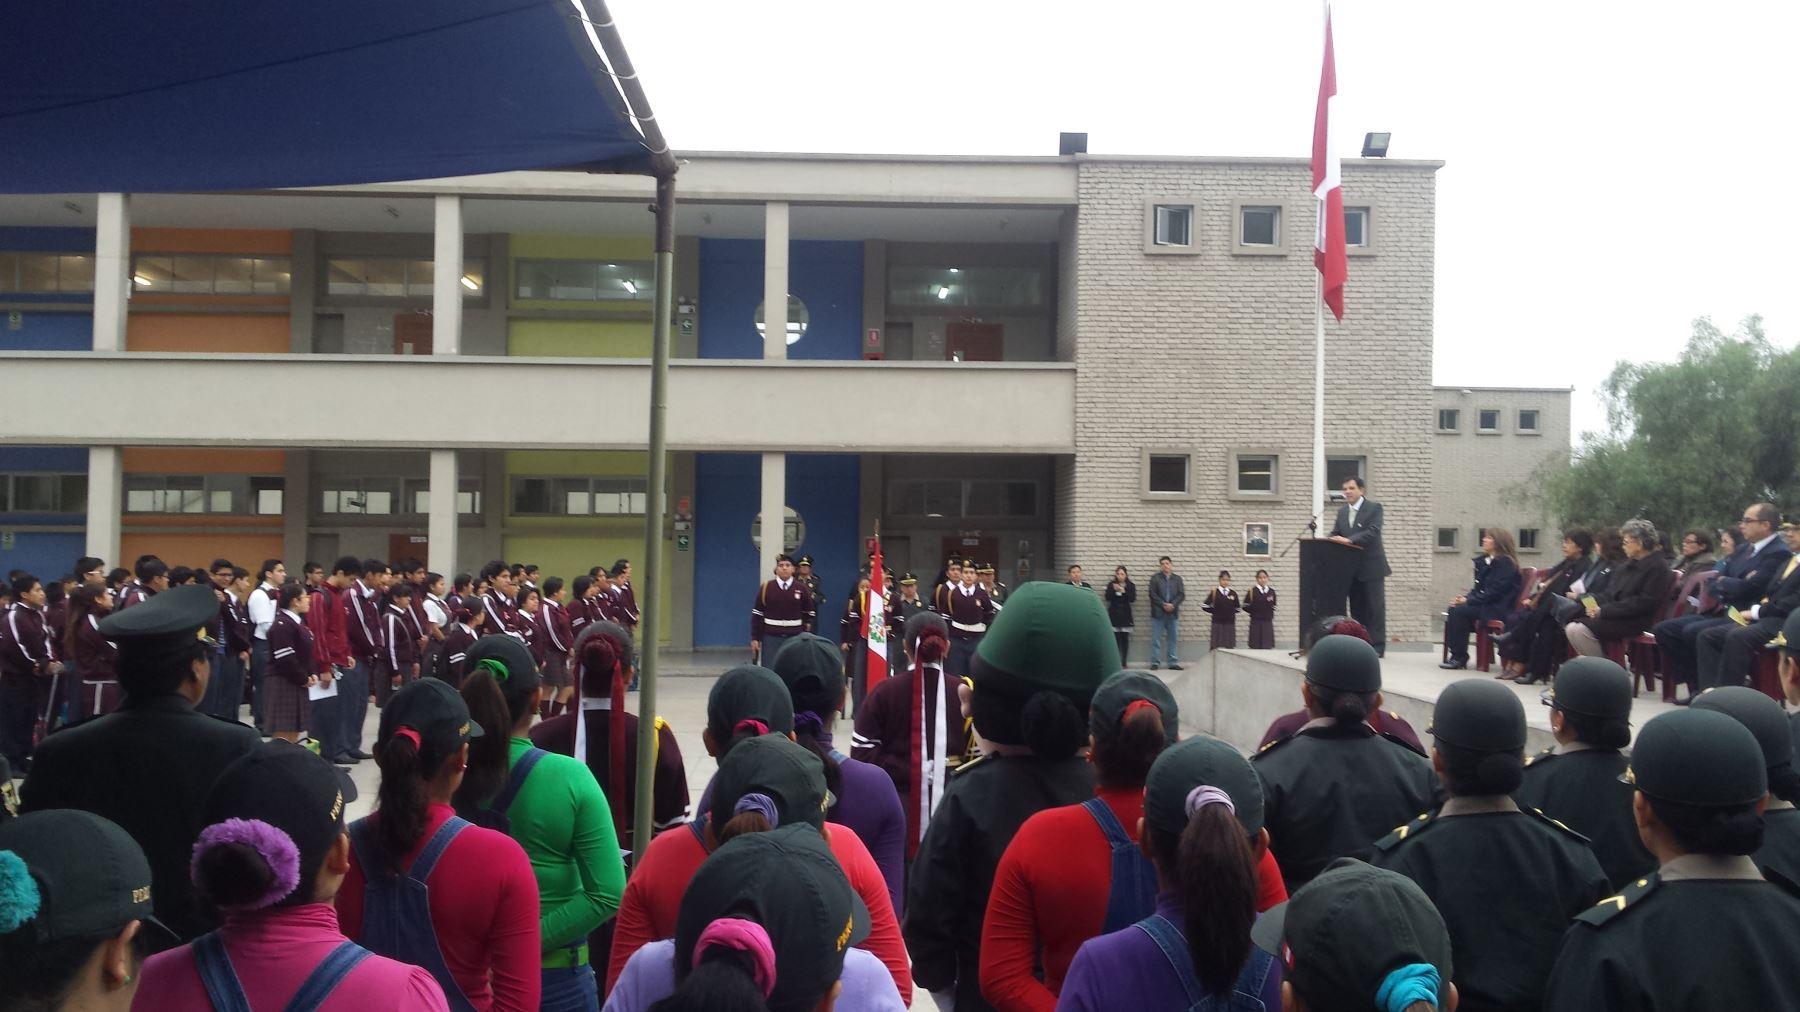 Ministerio del interior promueve civismo y autoprotecci n for Ministerio del interior ultimas noticias